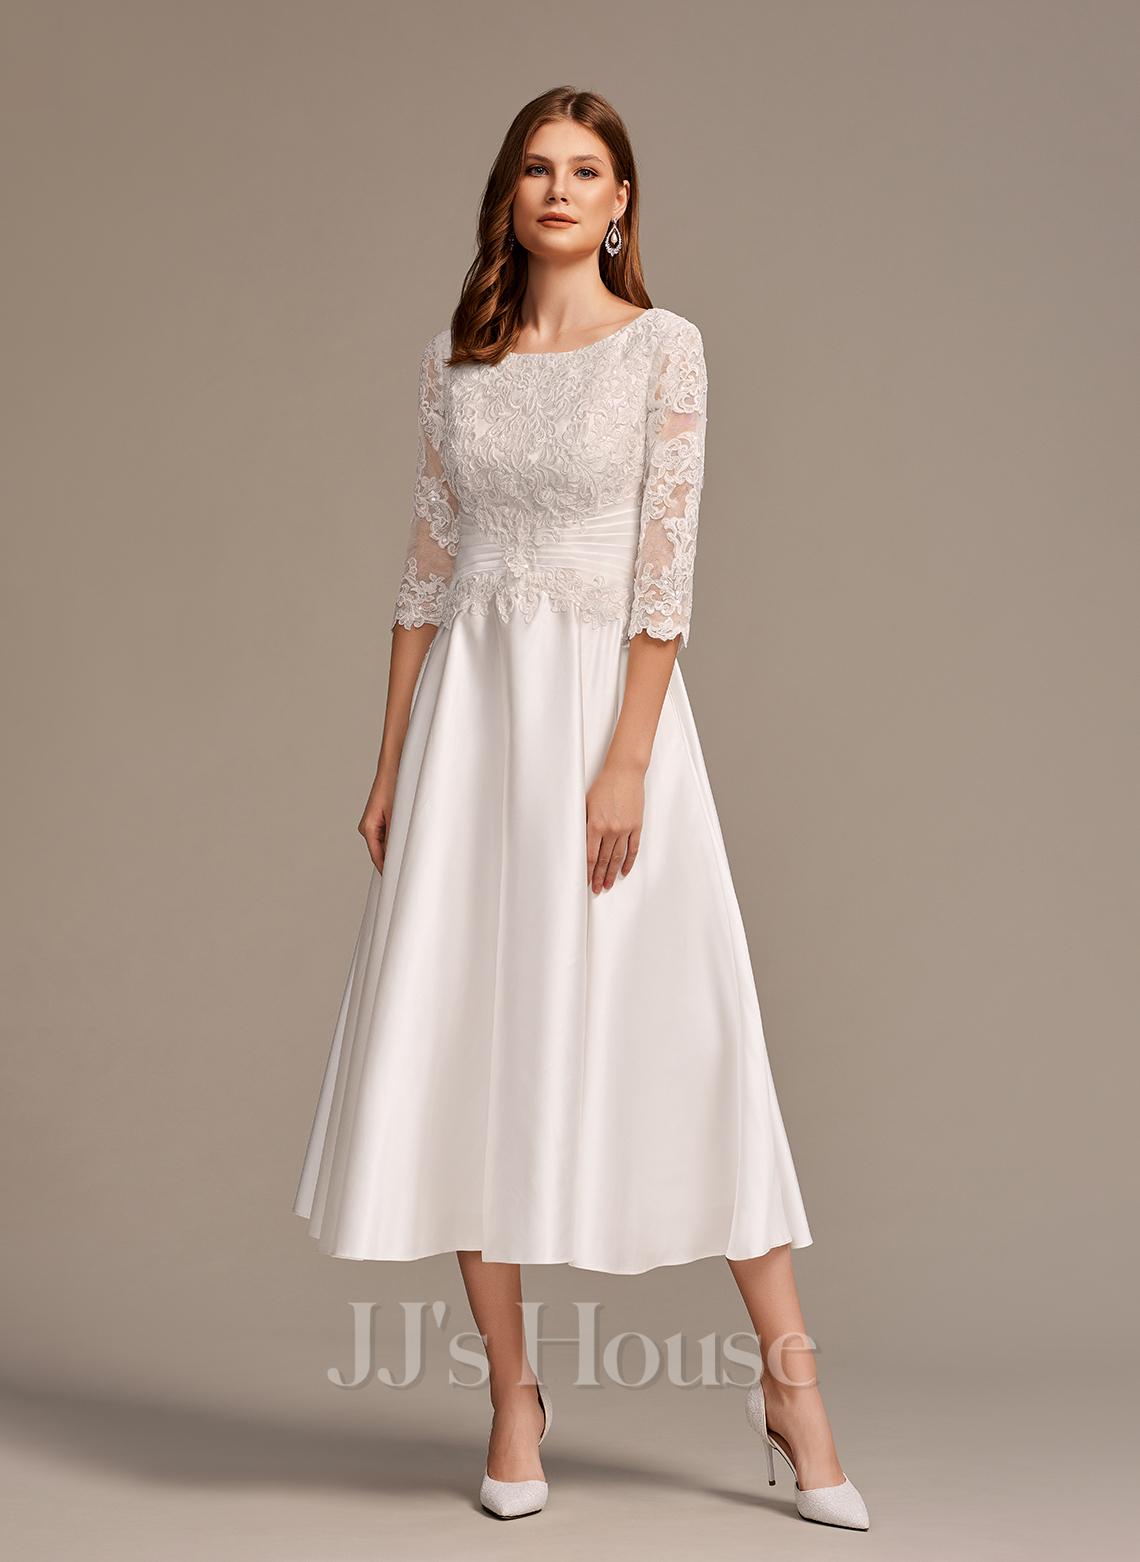 A-Line Scoop Neck Tea-Length Wedding Dress With Pockets